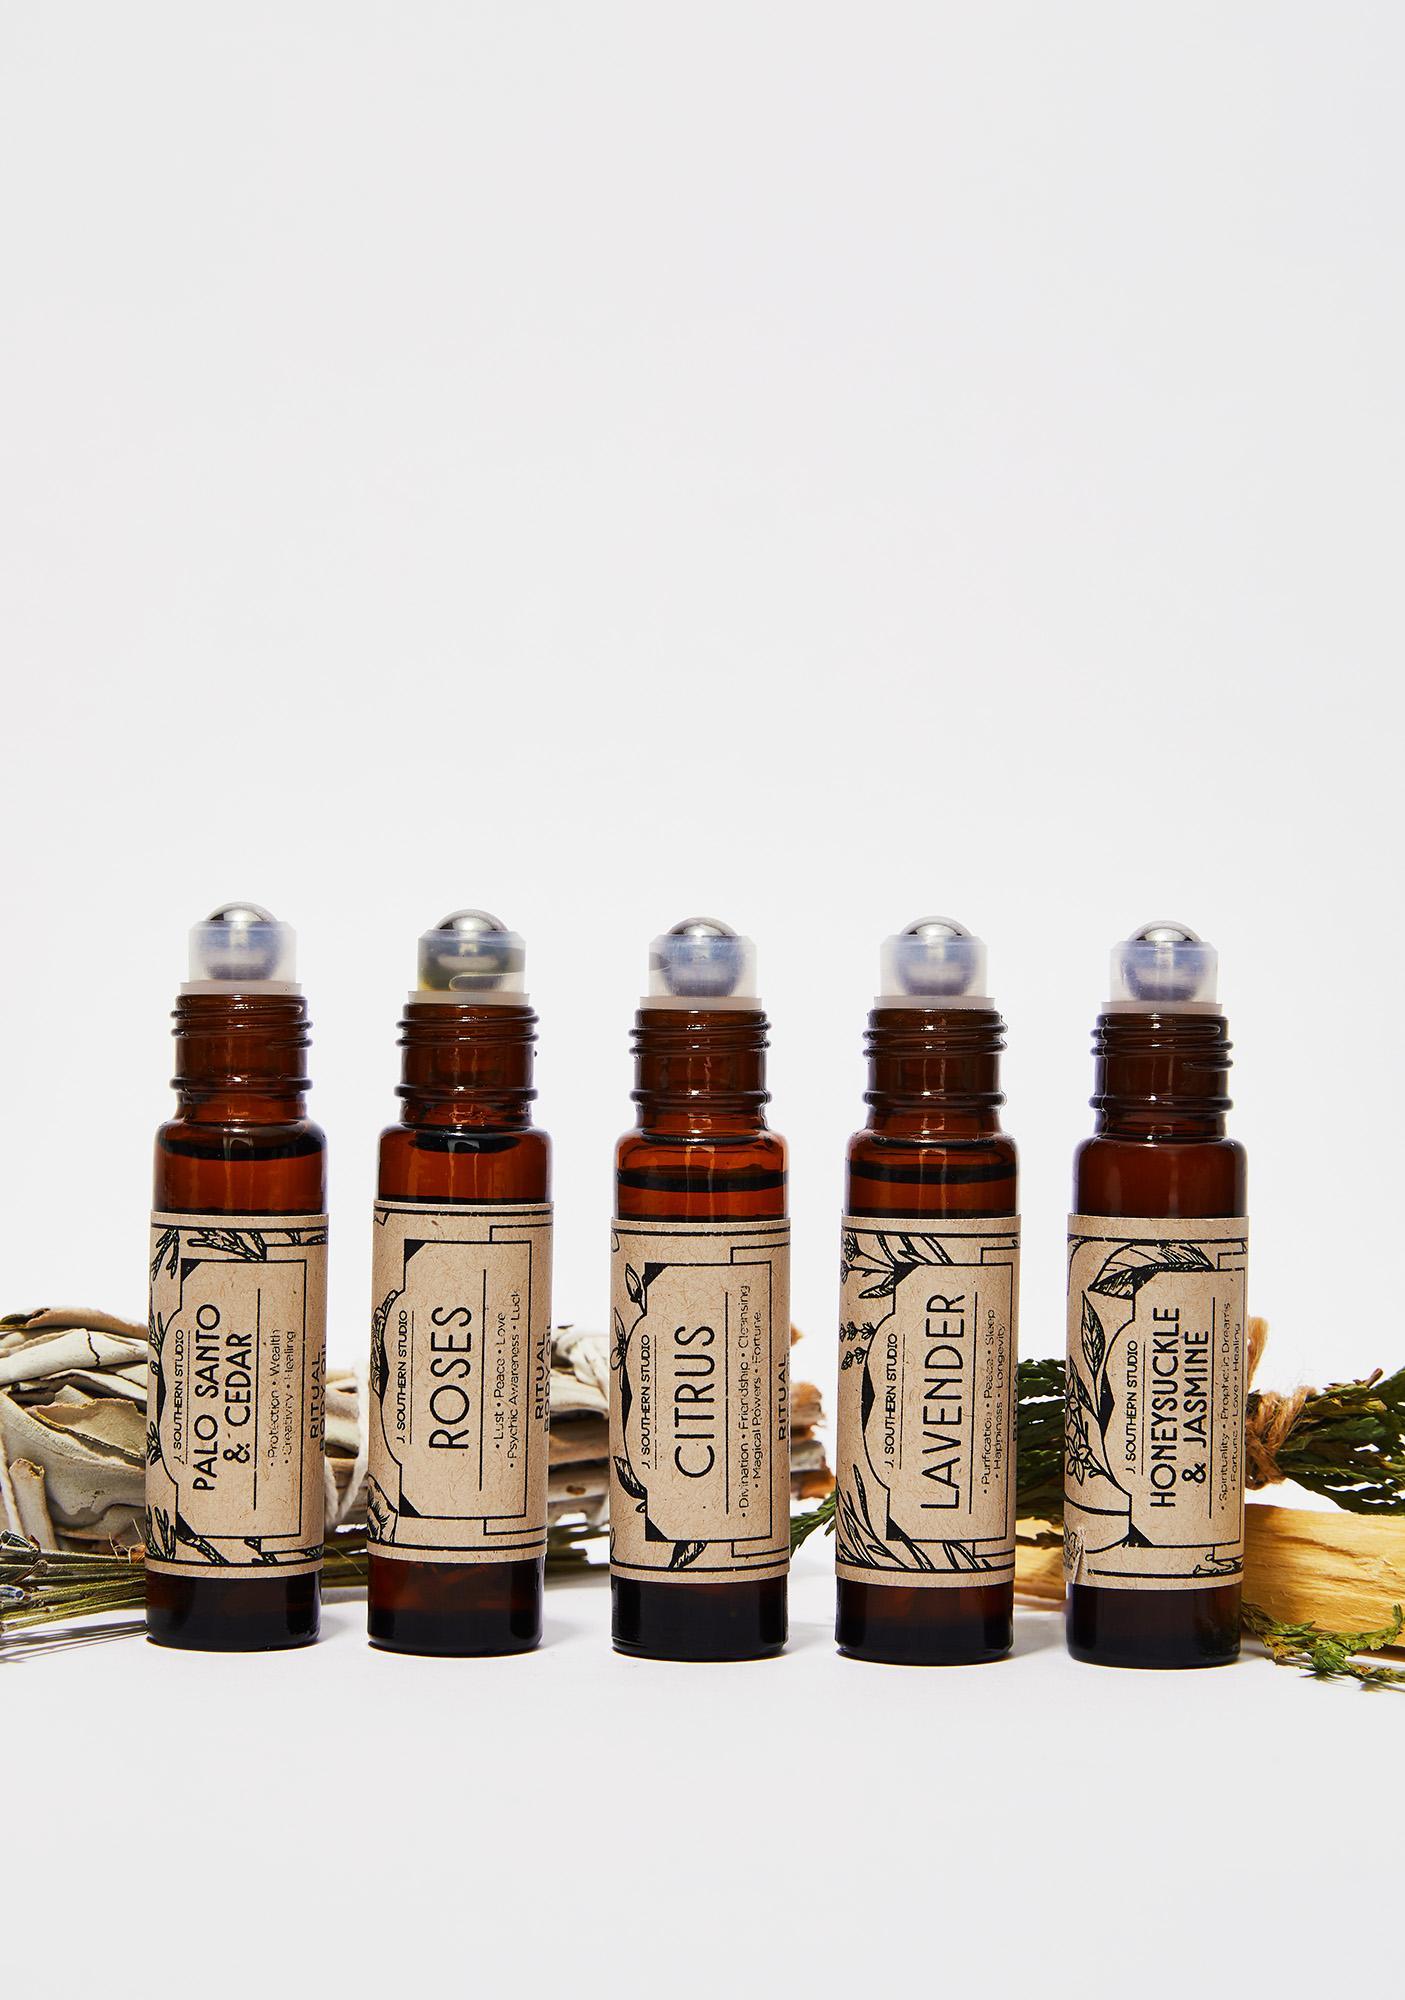 J. SOUTHERN STUDIO Palo Santo Cedar Ritual Oil